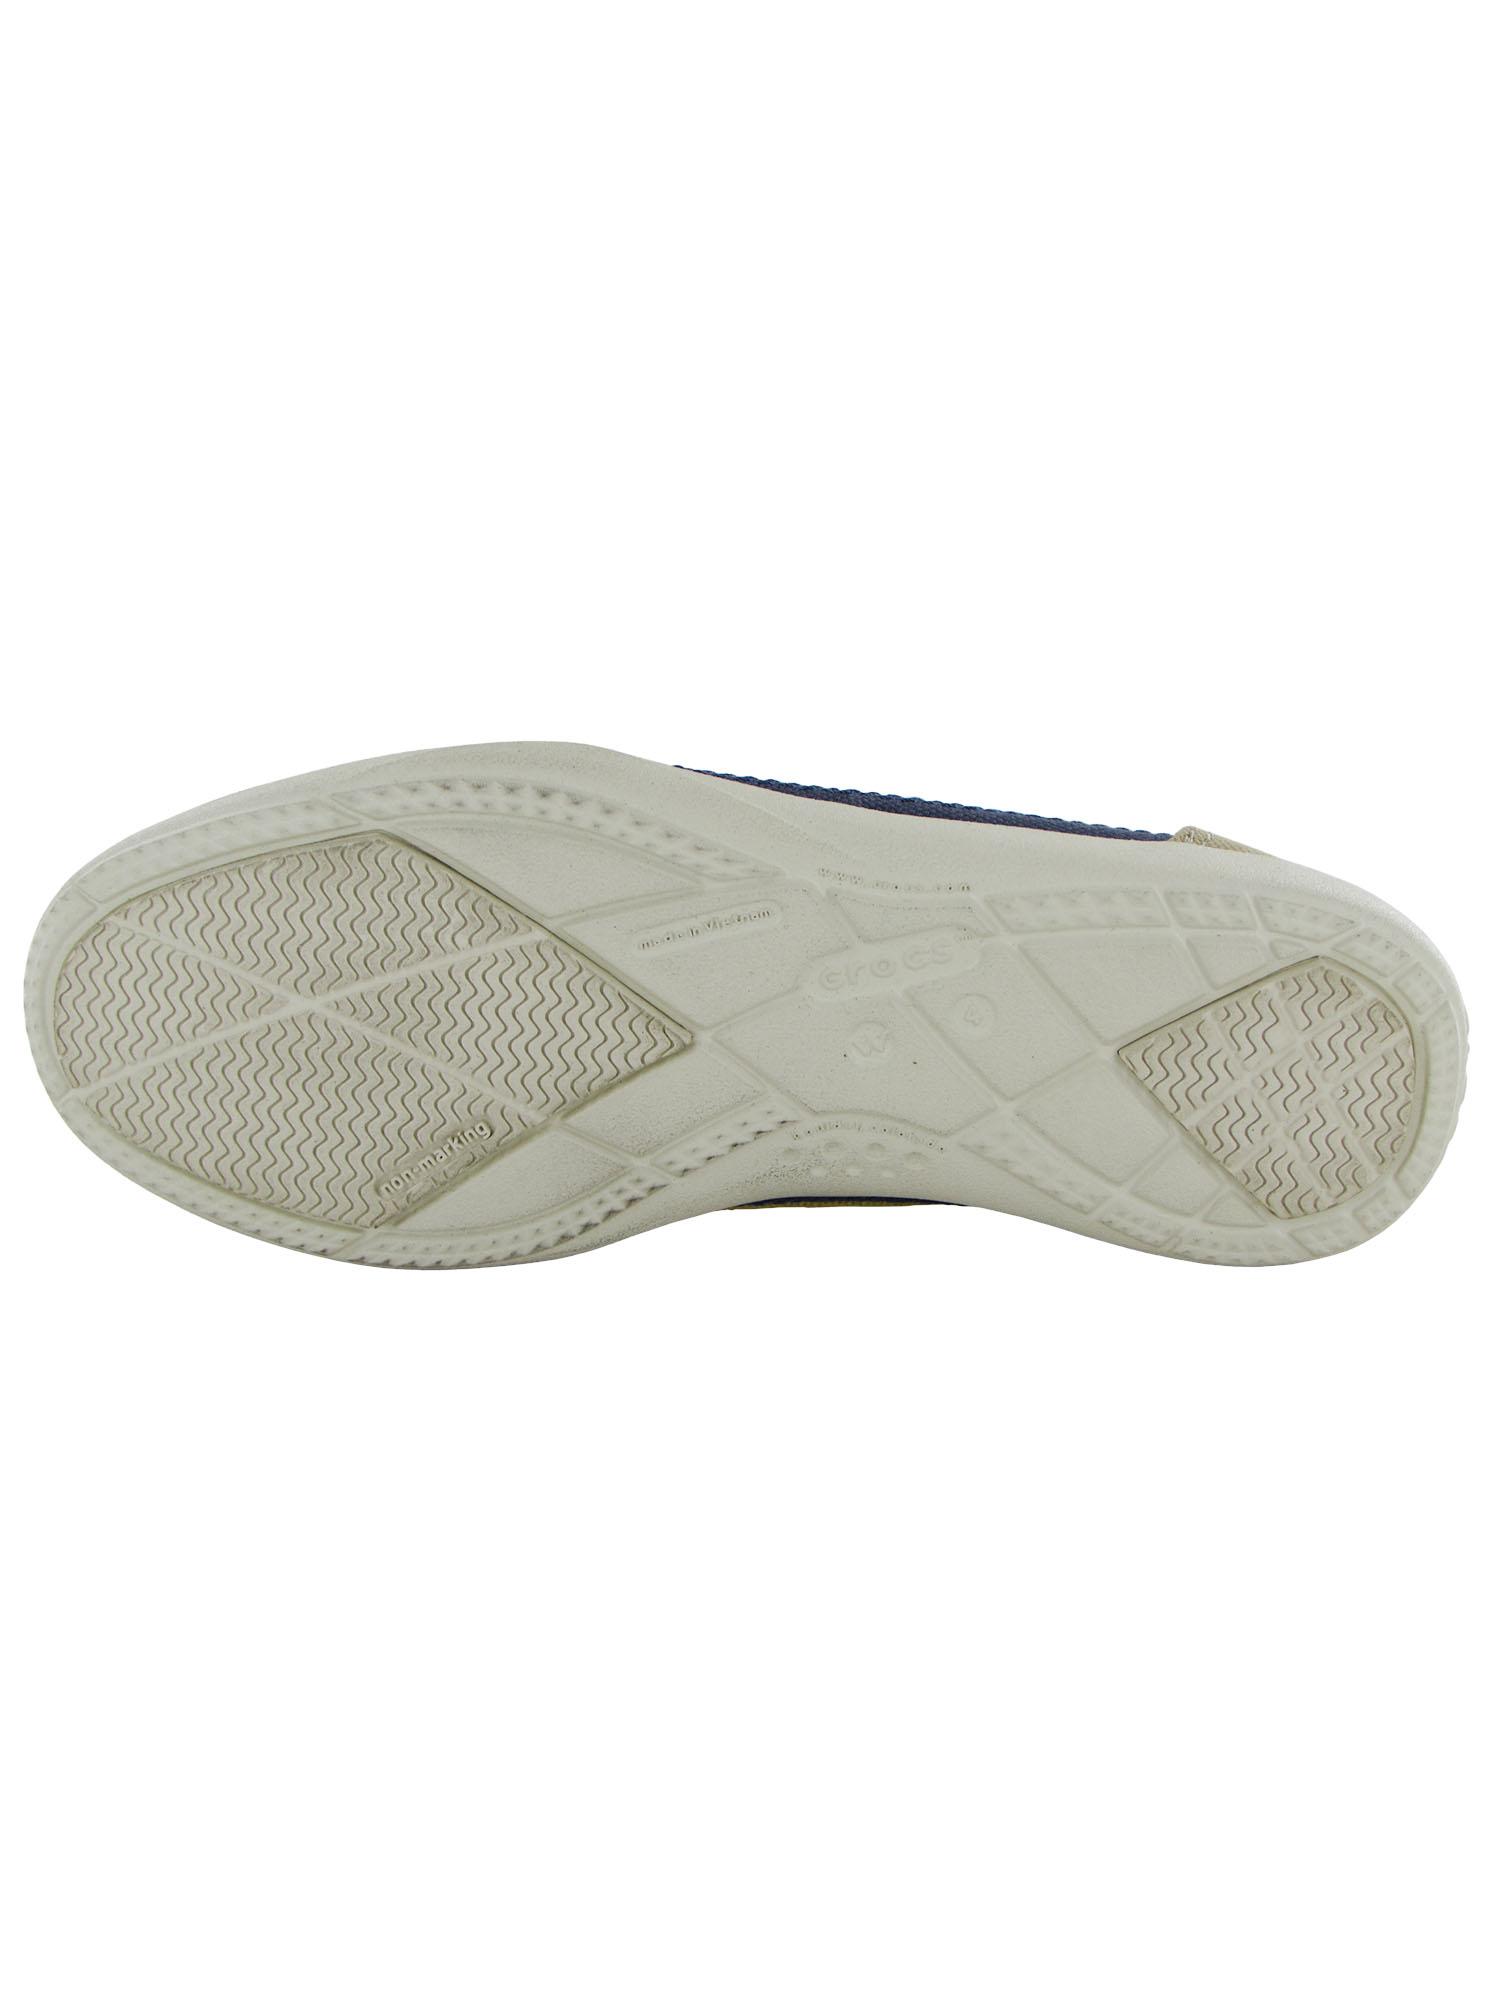 Crocs-Womens-Walu-Canvas-Loafer-Slip-On-Shoe thumbnail 9